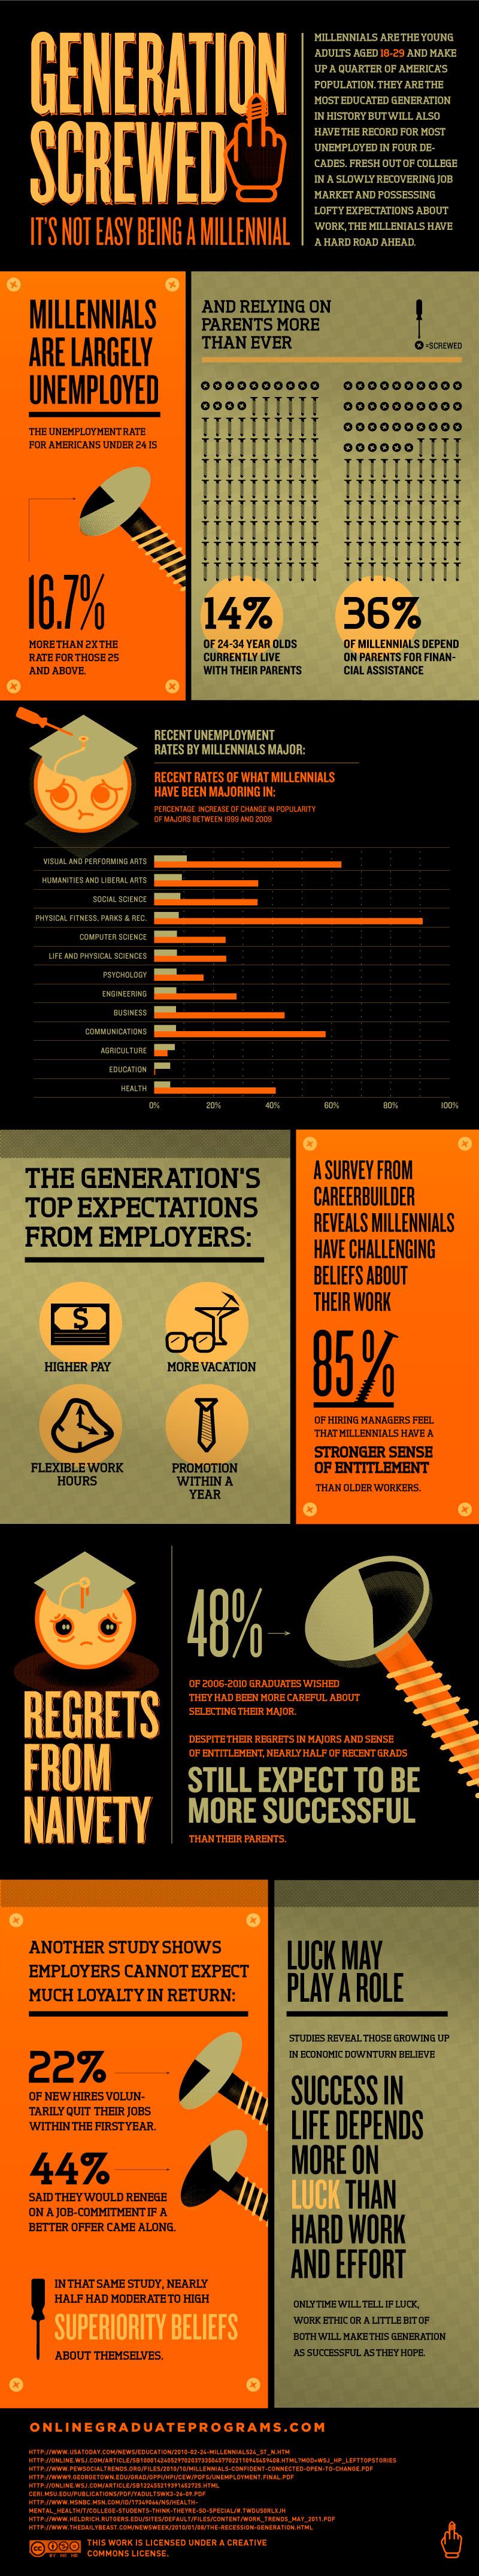 Generation Screwed